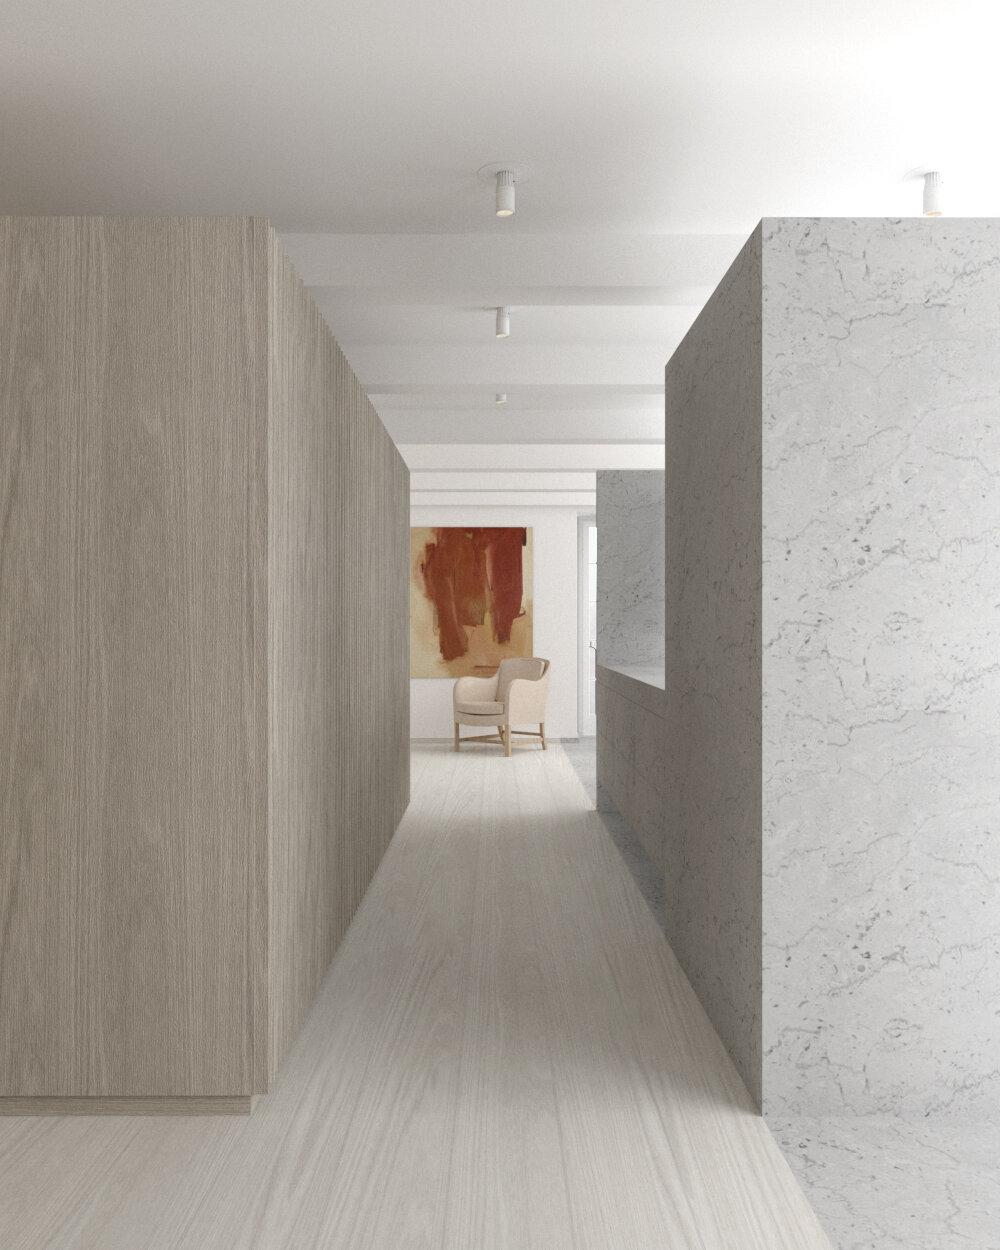 Kjaer-Architecture_Antionettesminde_01.jpg